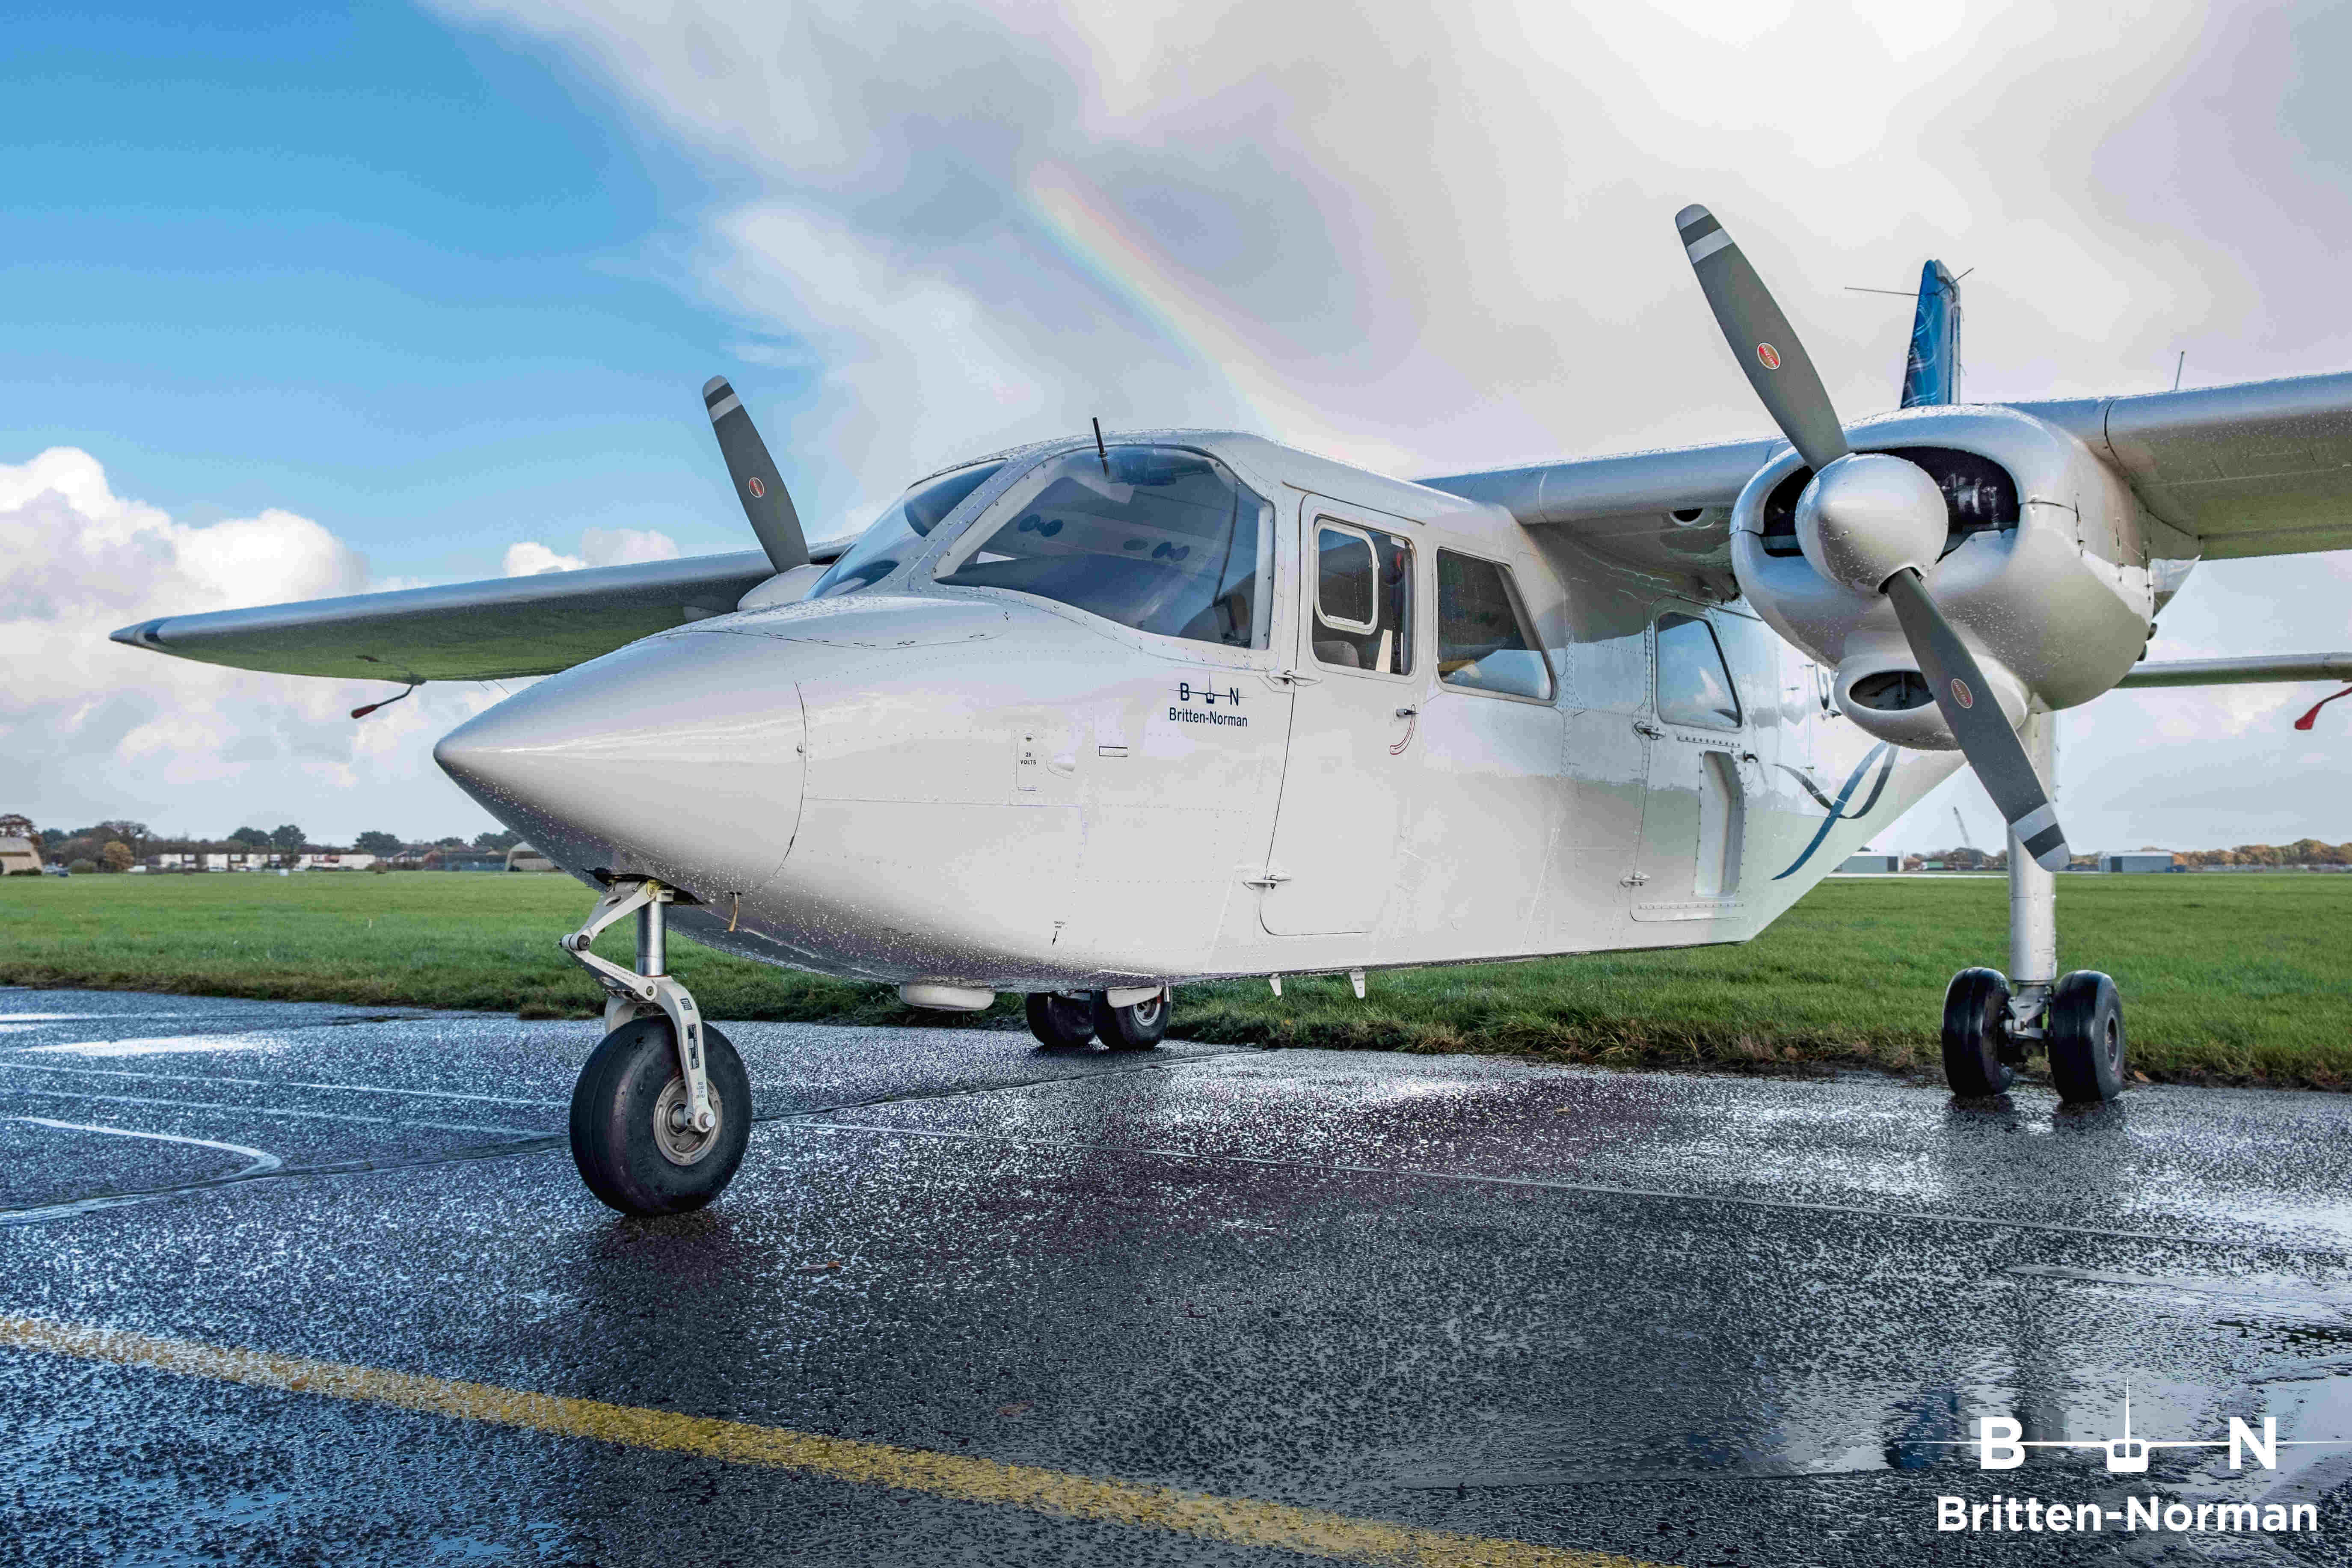 Britten-Norman Launches New Lease Options - Britten Norman